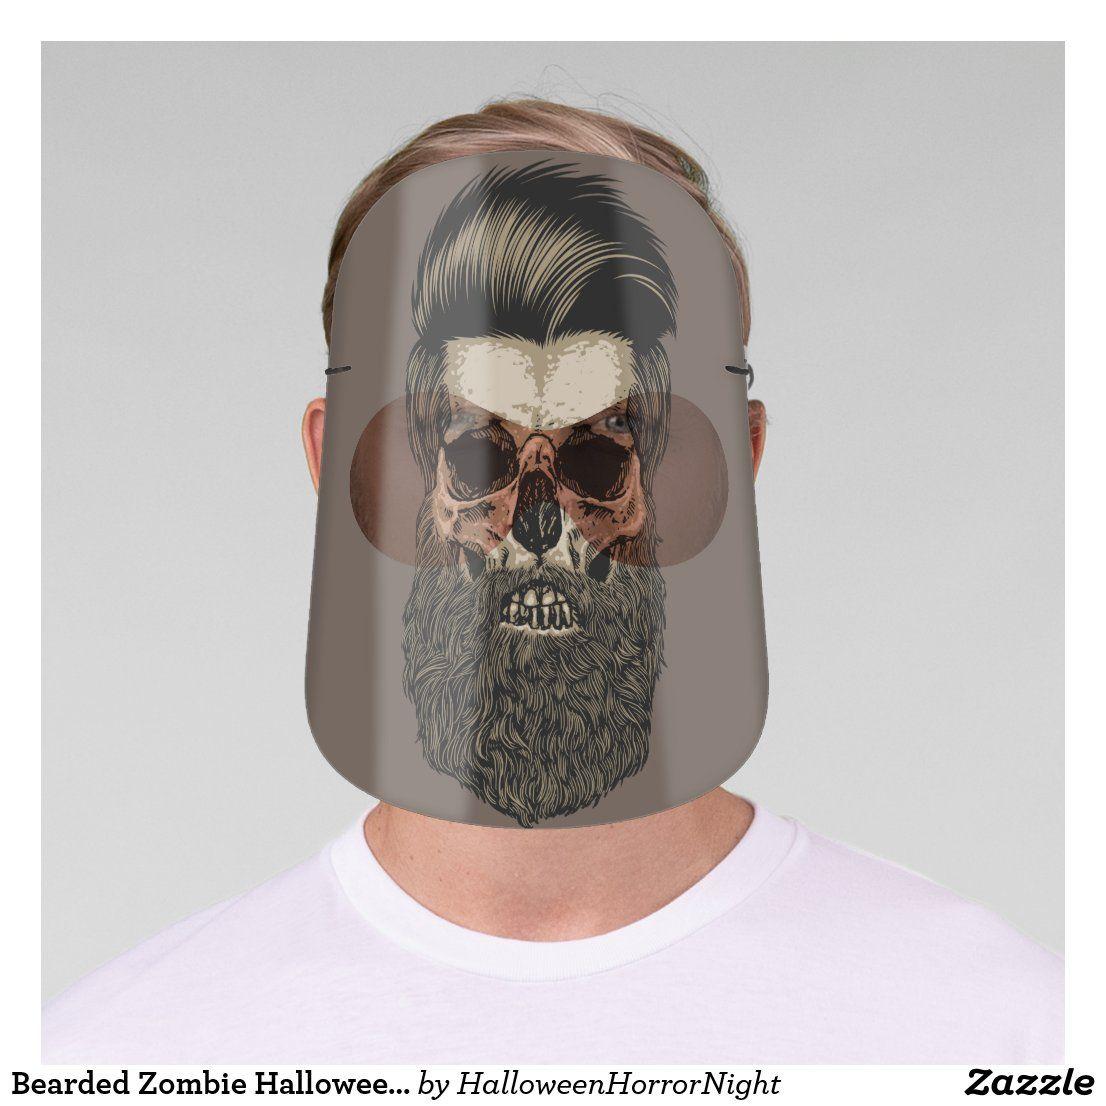 Bearded Zombie Halloween Scary Face Shield in